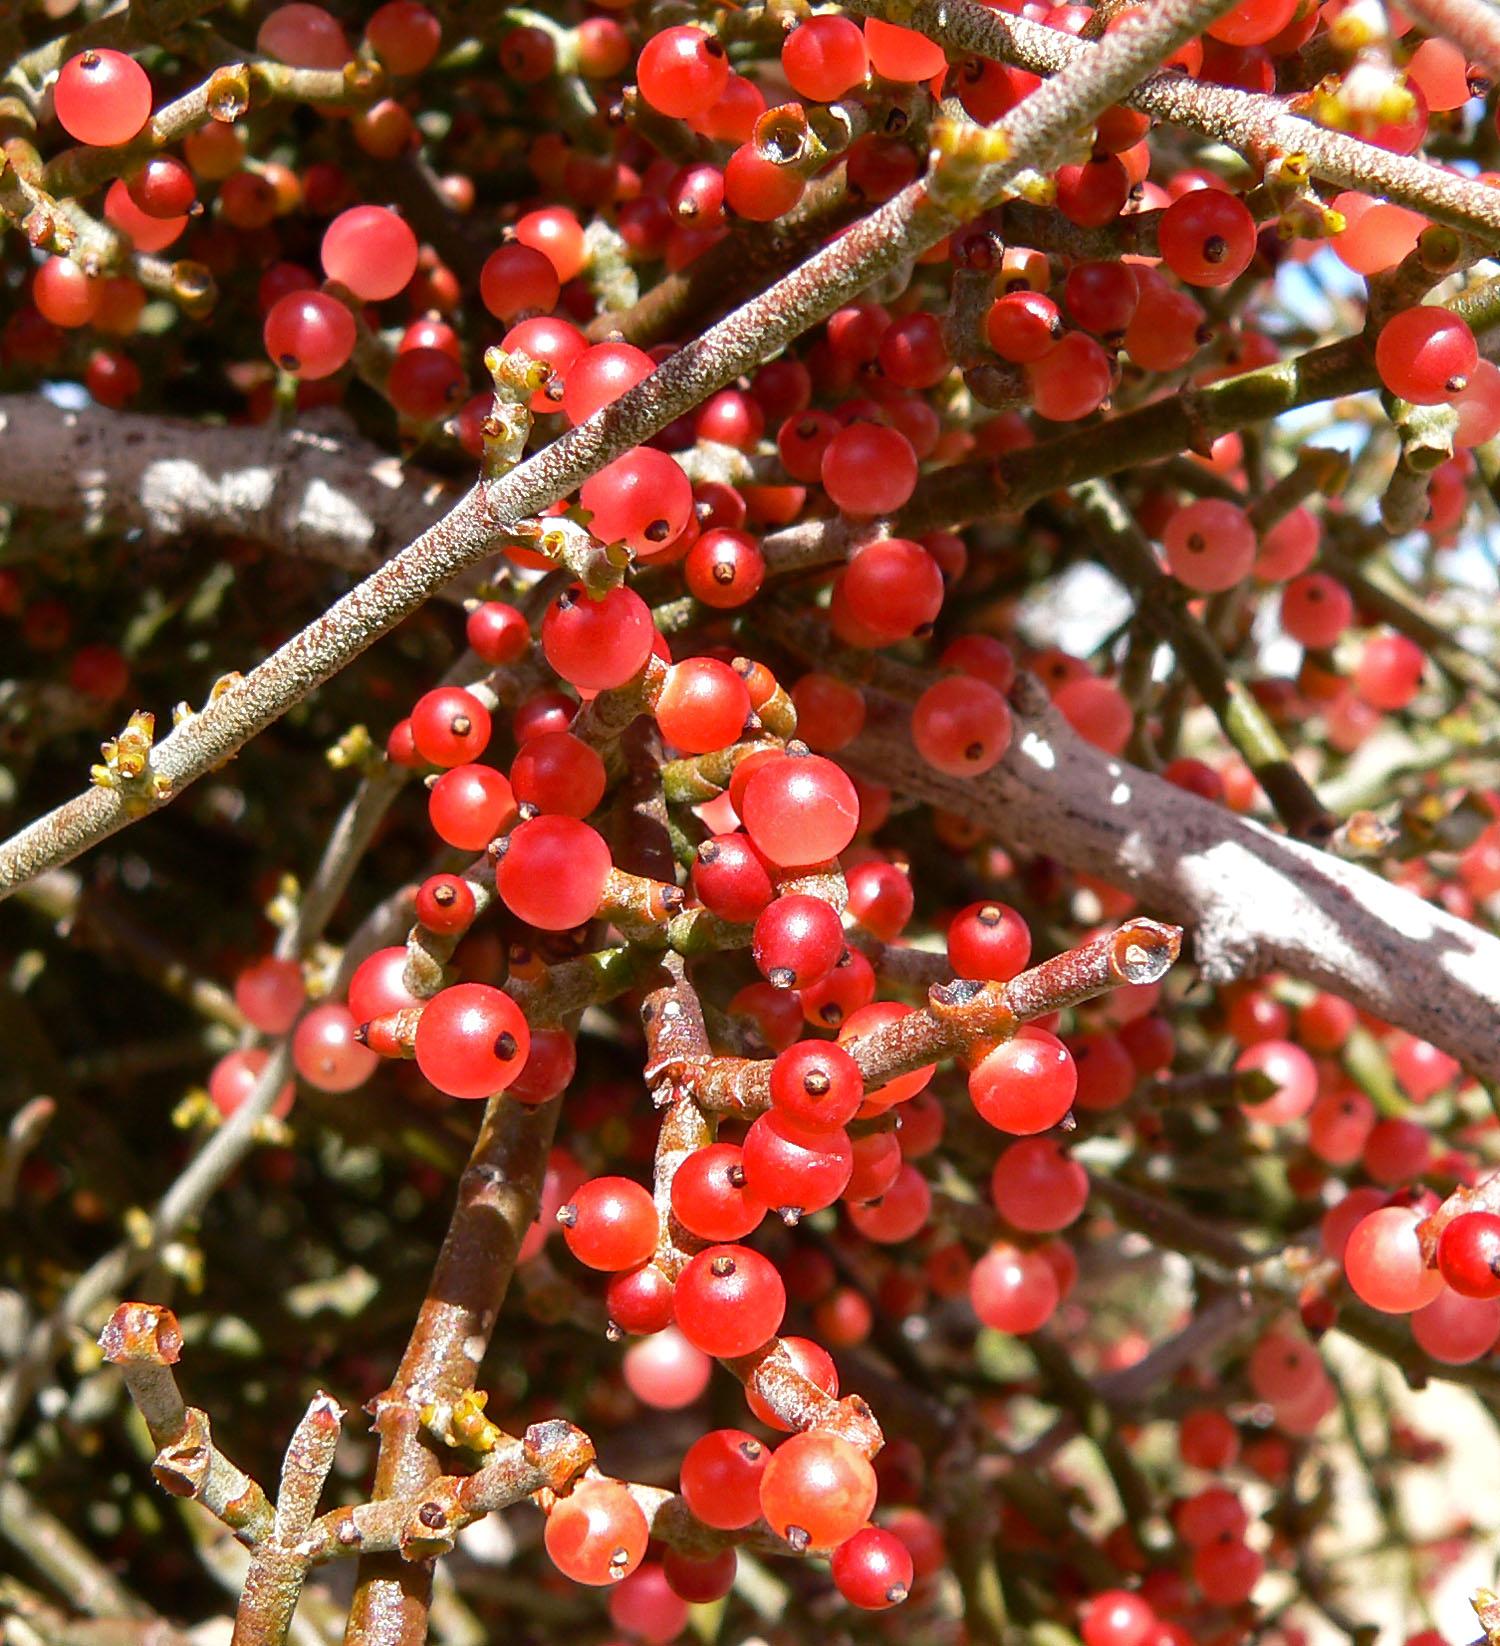 Phoradendron_californicum_6.jpg